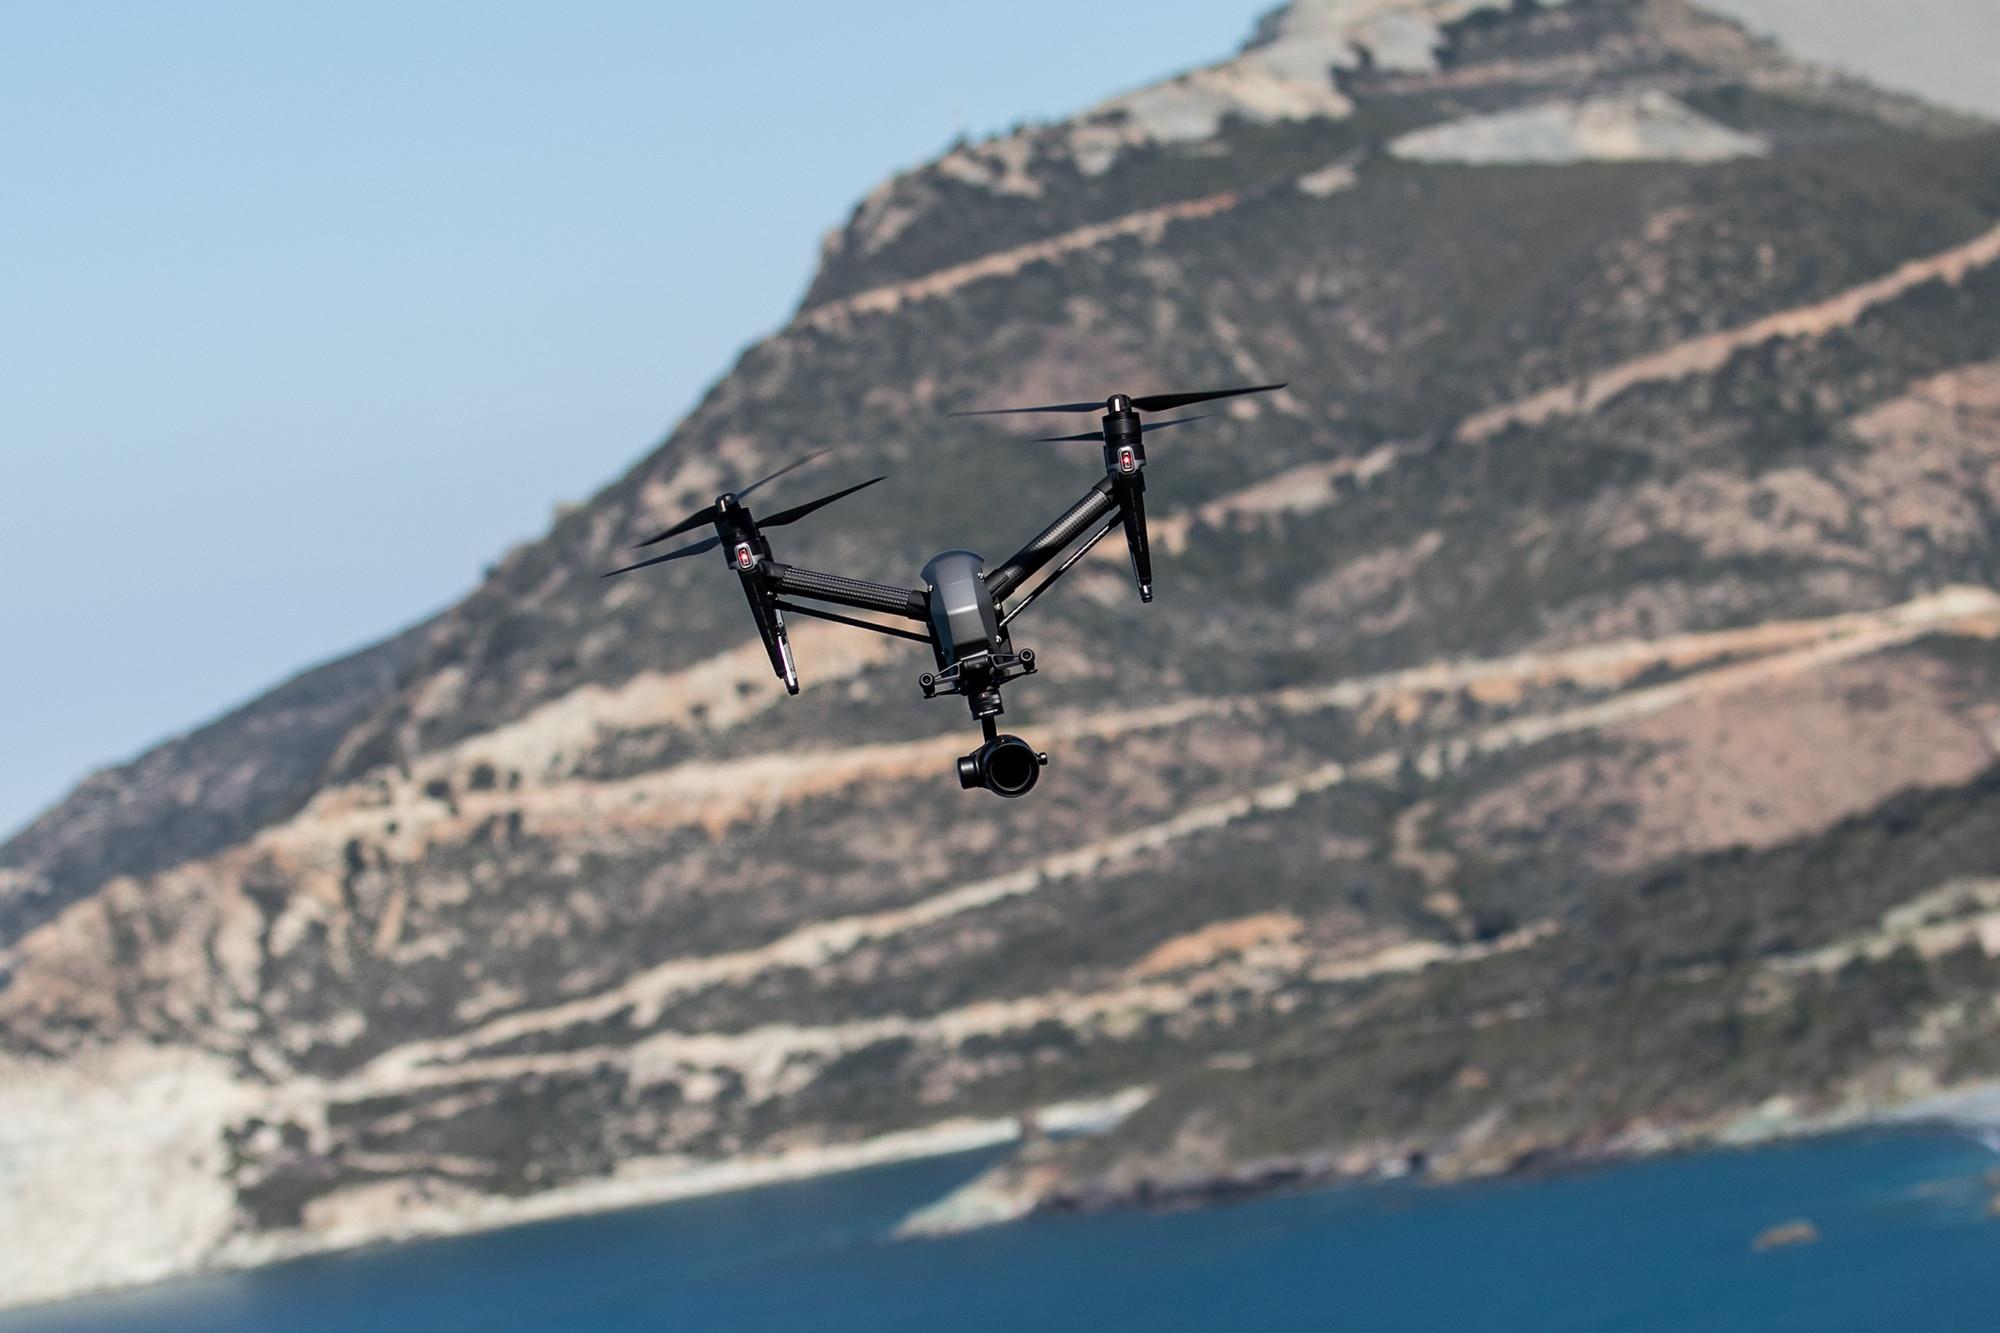 Drone en vol à Nonza